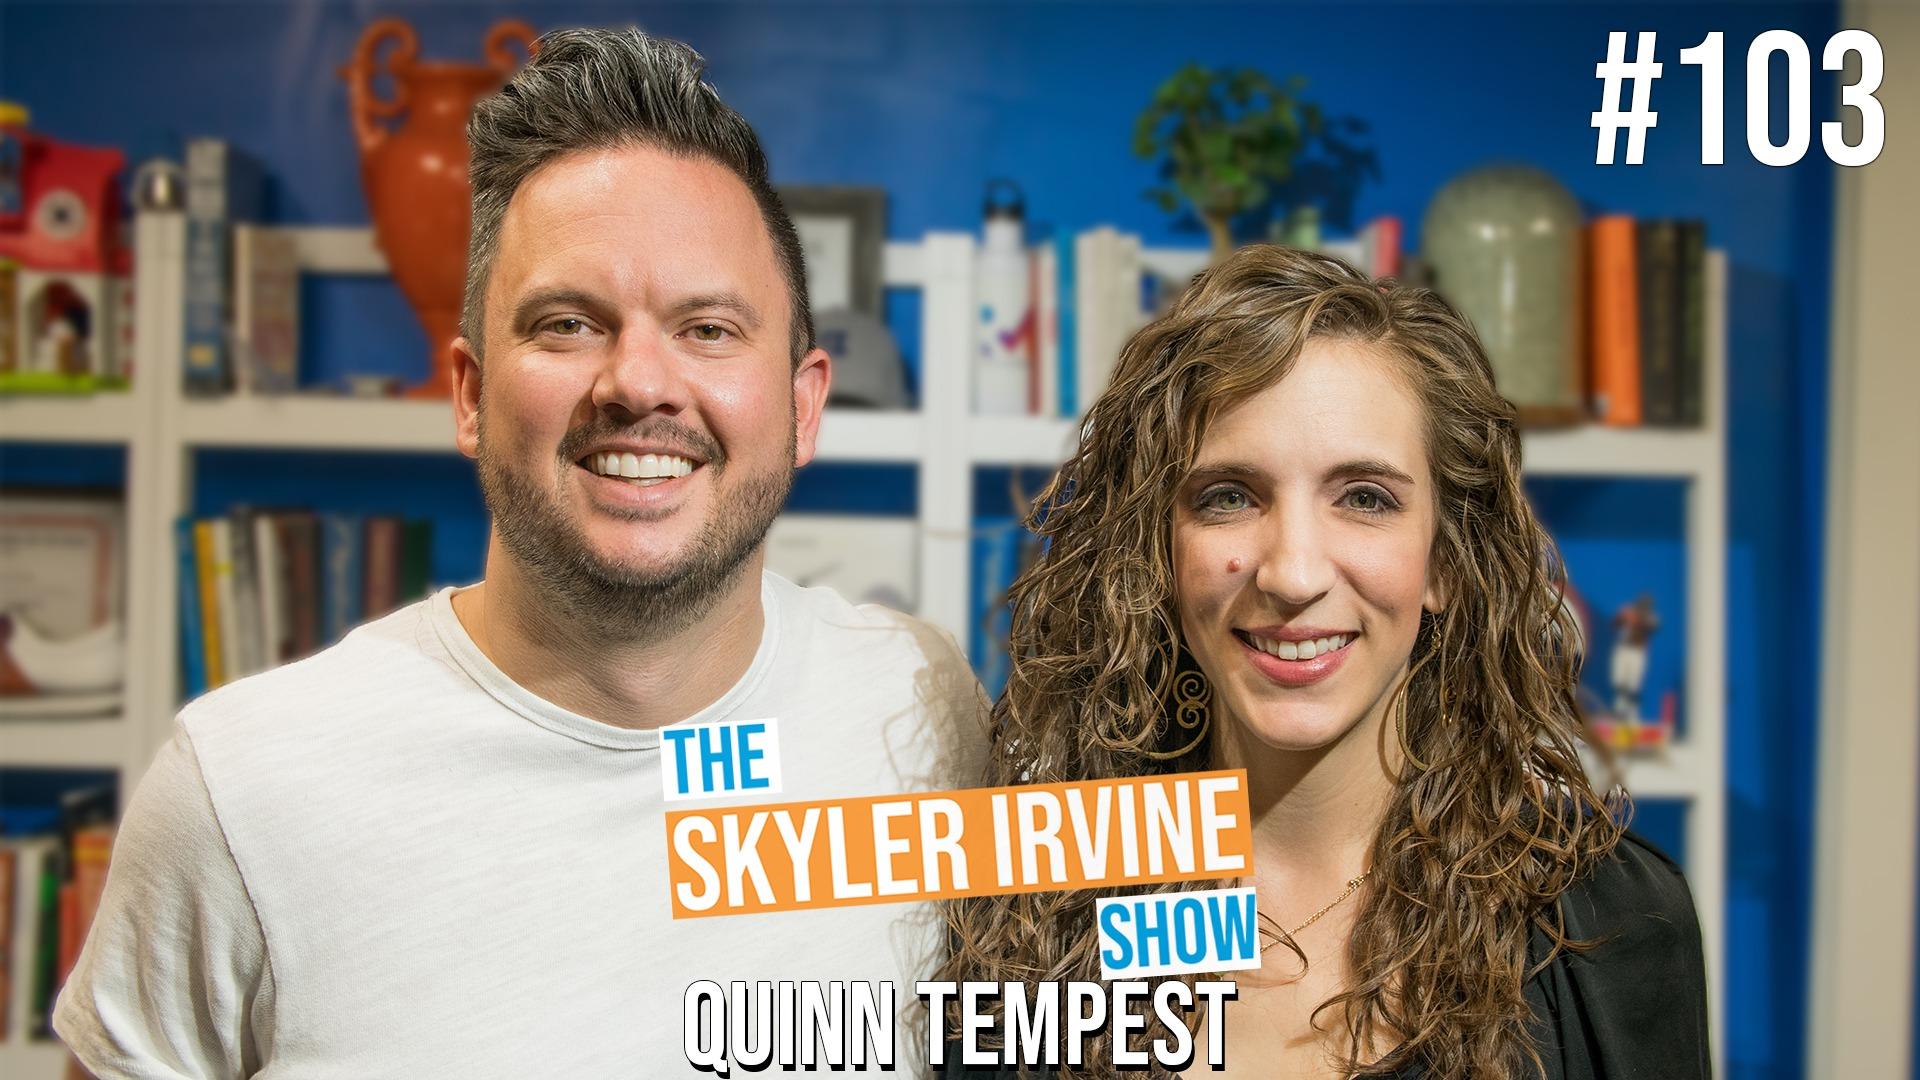 Quinn Tempest Digital Summit